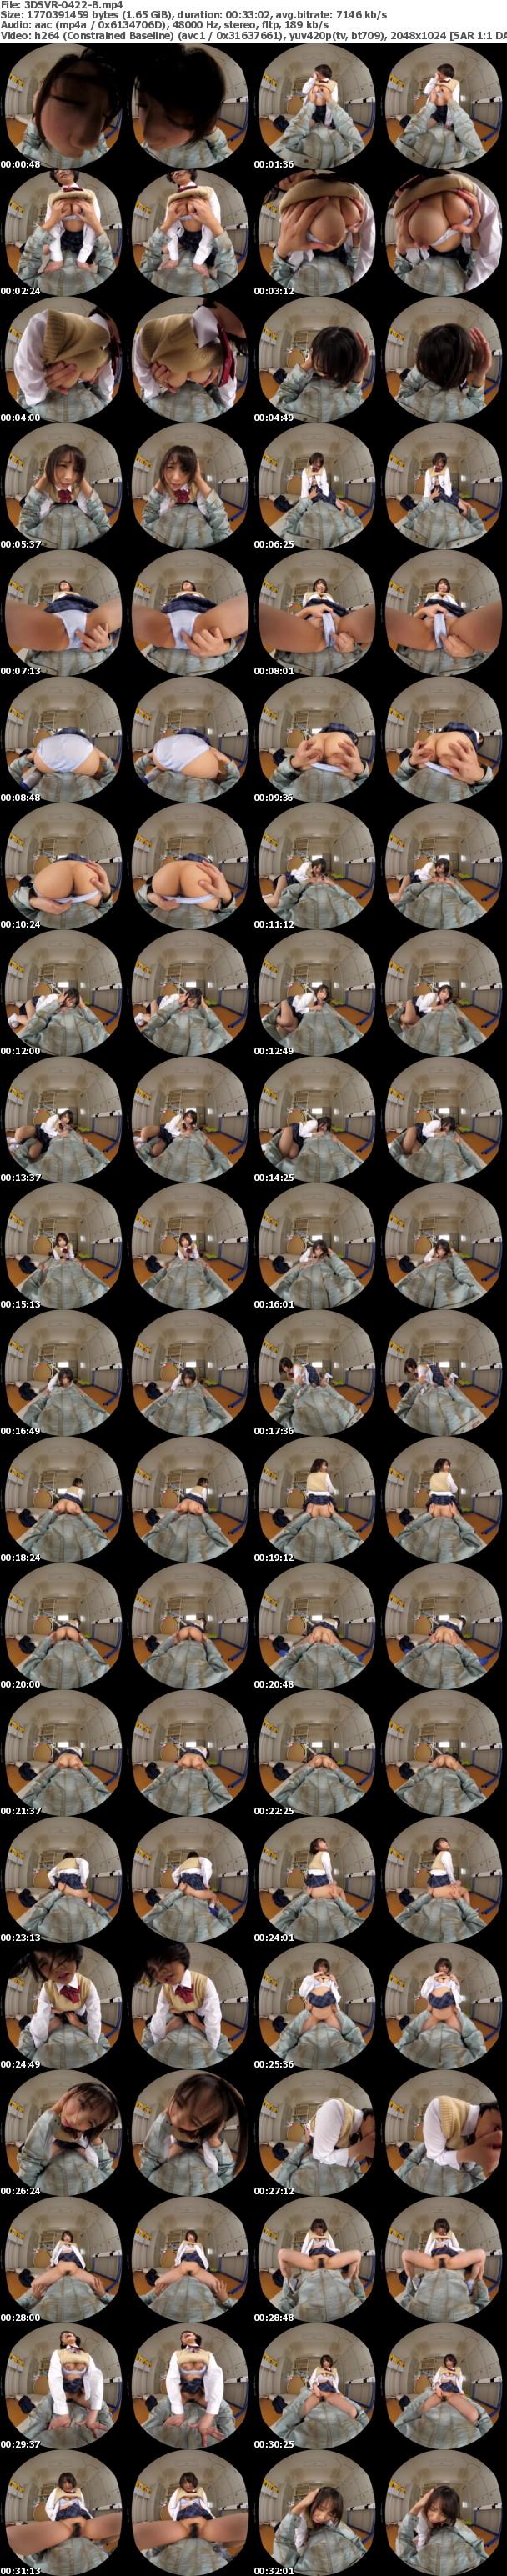 (VR) 3DSVR-0422 【サイレント レ×プVR】ロッカーの中に引きずり込み犯す 戸田真琴